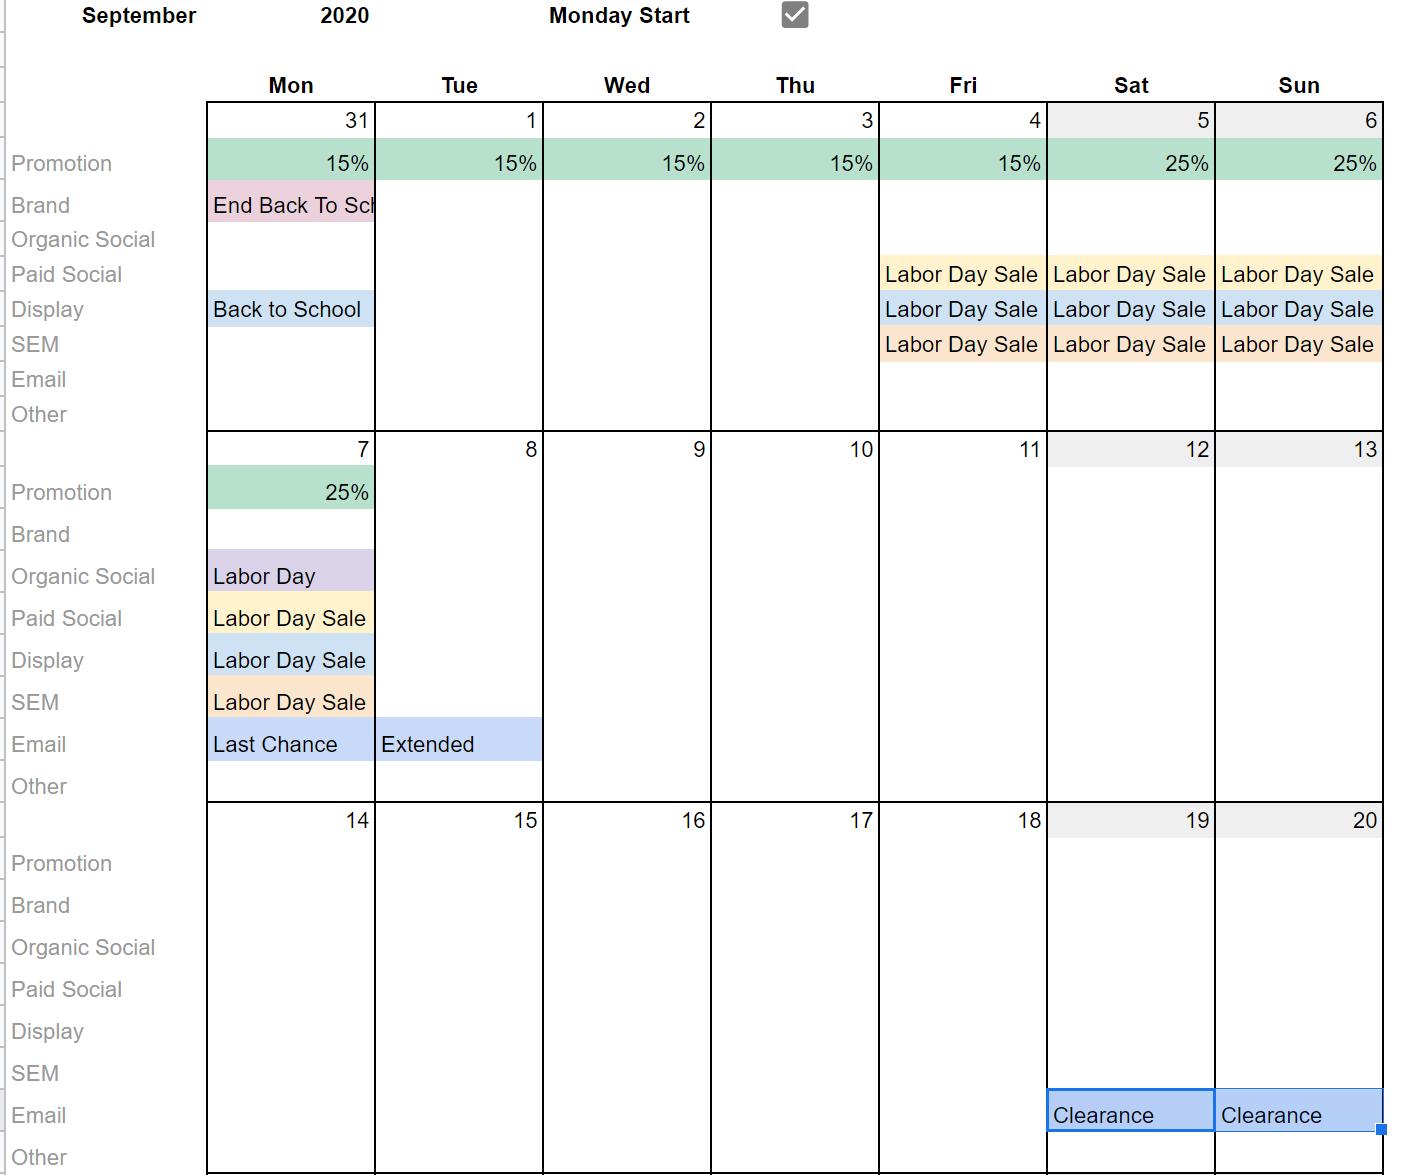 15269990-f12b-11ea-a300-0242ac110003-prod_marketing_calendar_ss_1 (1).png